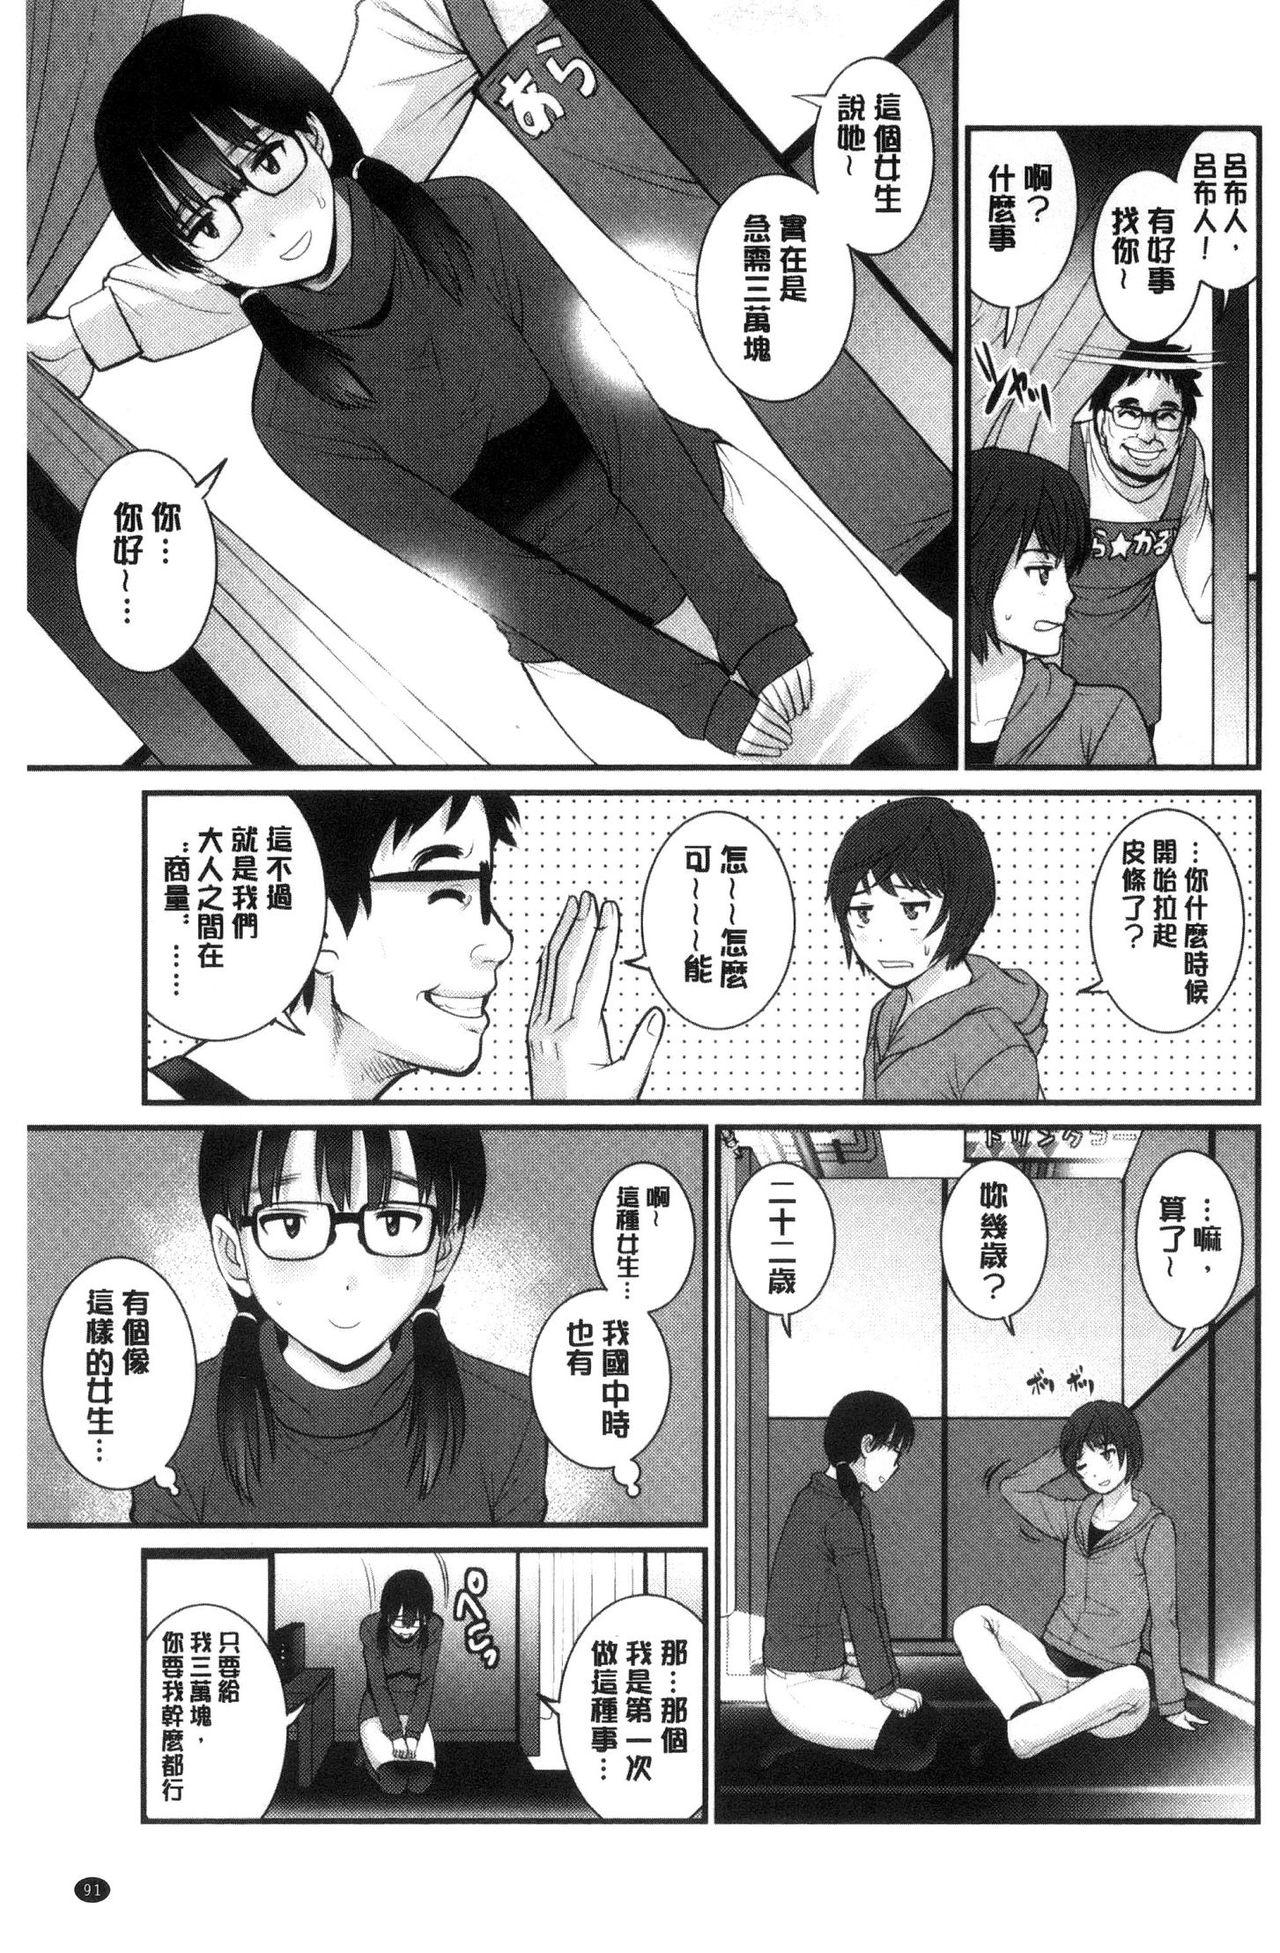 Toshimaku Sodachi no Toshima-san   年增區孕育的豐島小姐 91